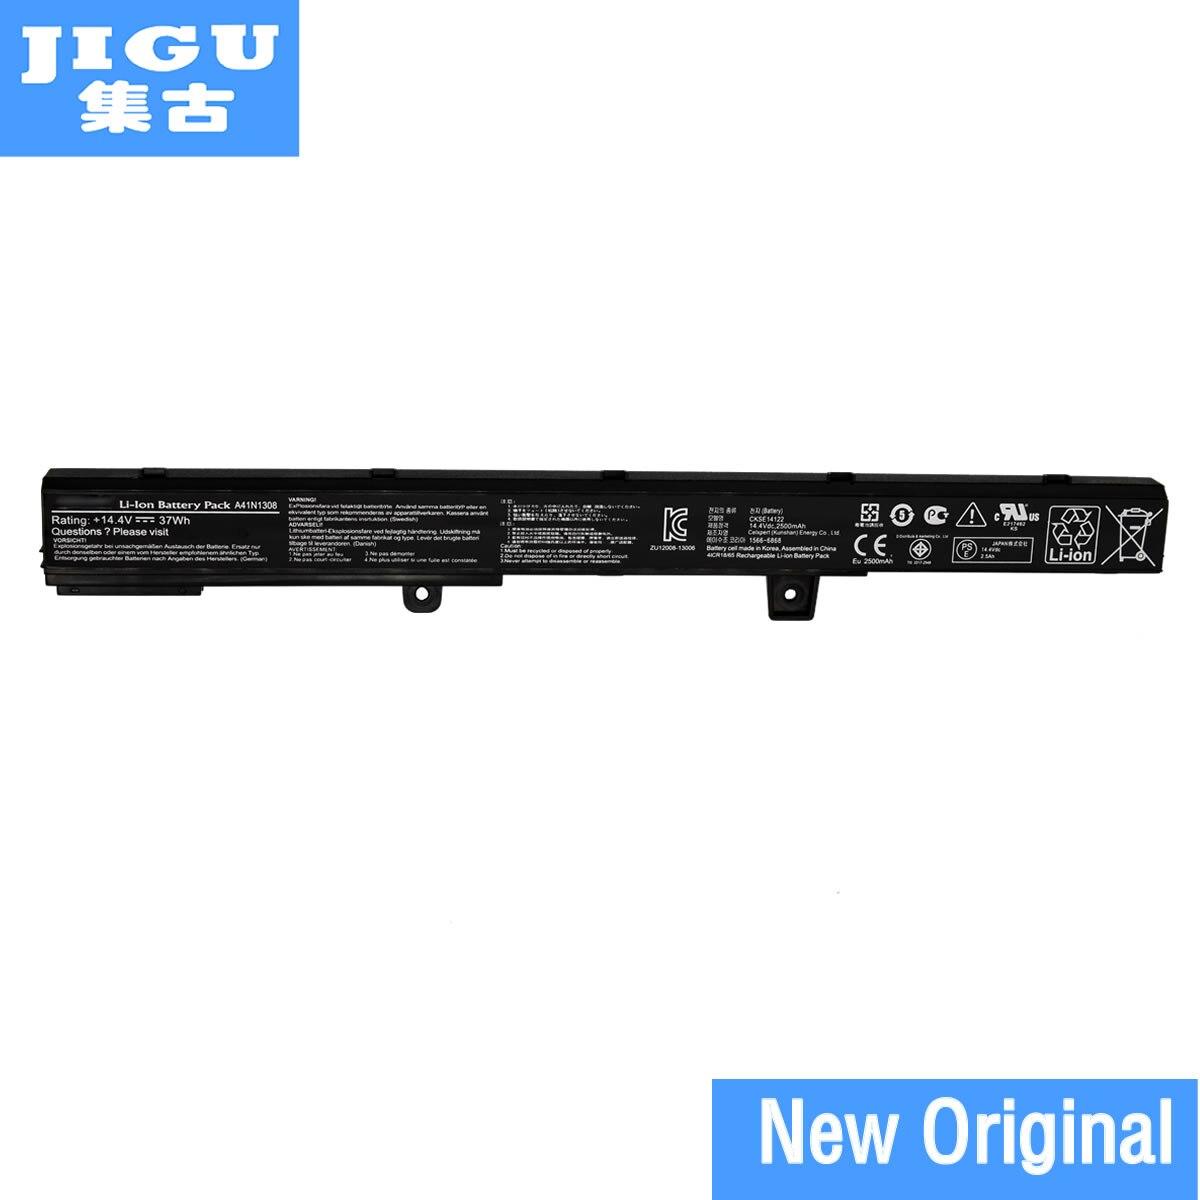 JIGU A31N1319 A41N1308 Оригинальный аккумулятор для ноутбука ASUS X451 X451C X451CA X551 X551C X551CA D550M D550MA F551M X551MA